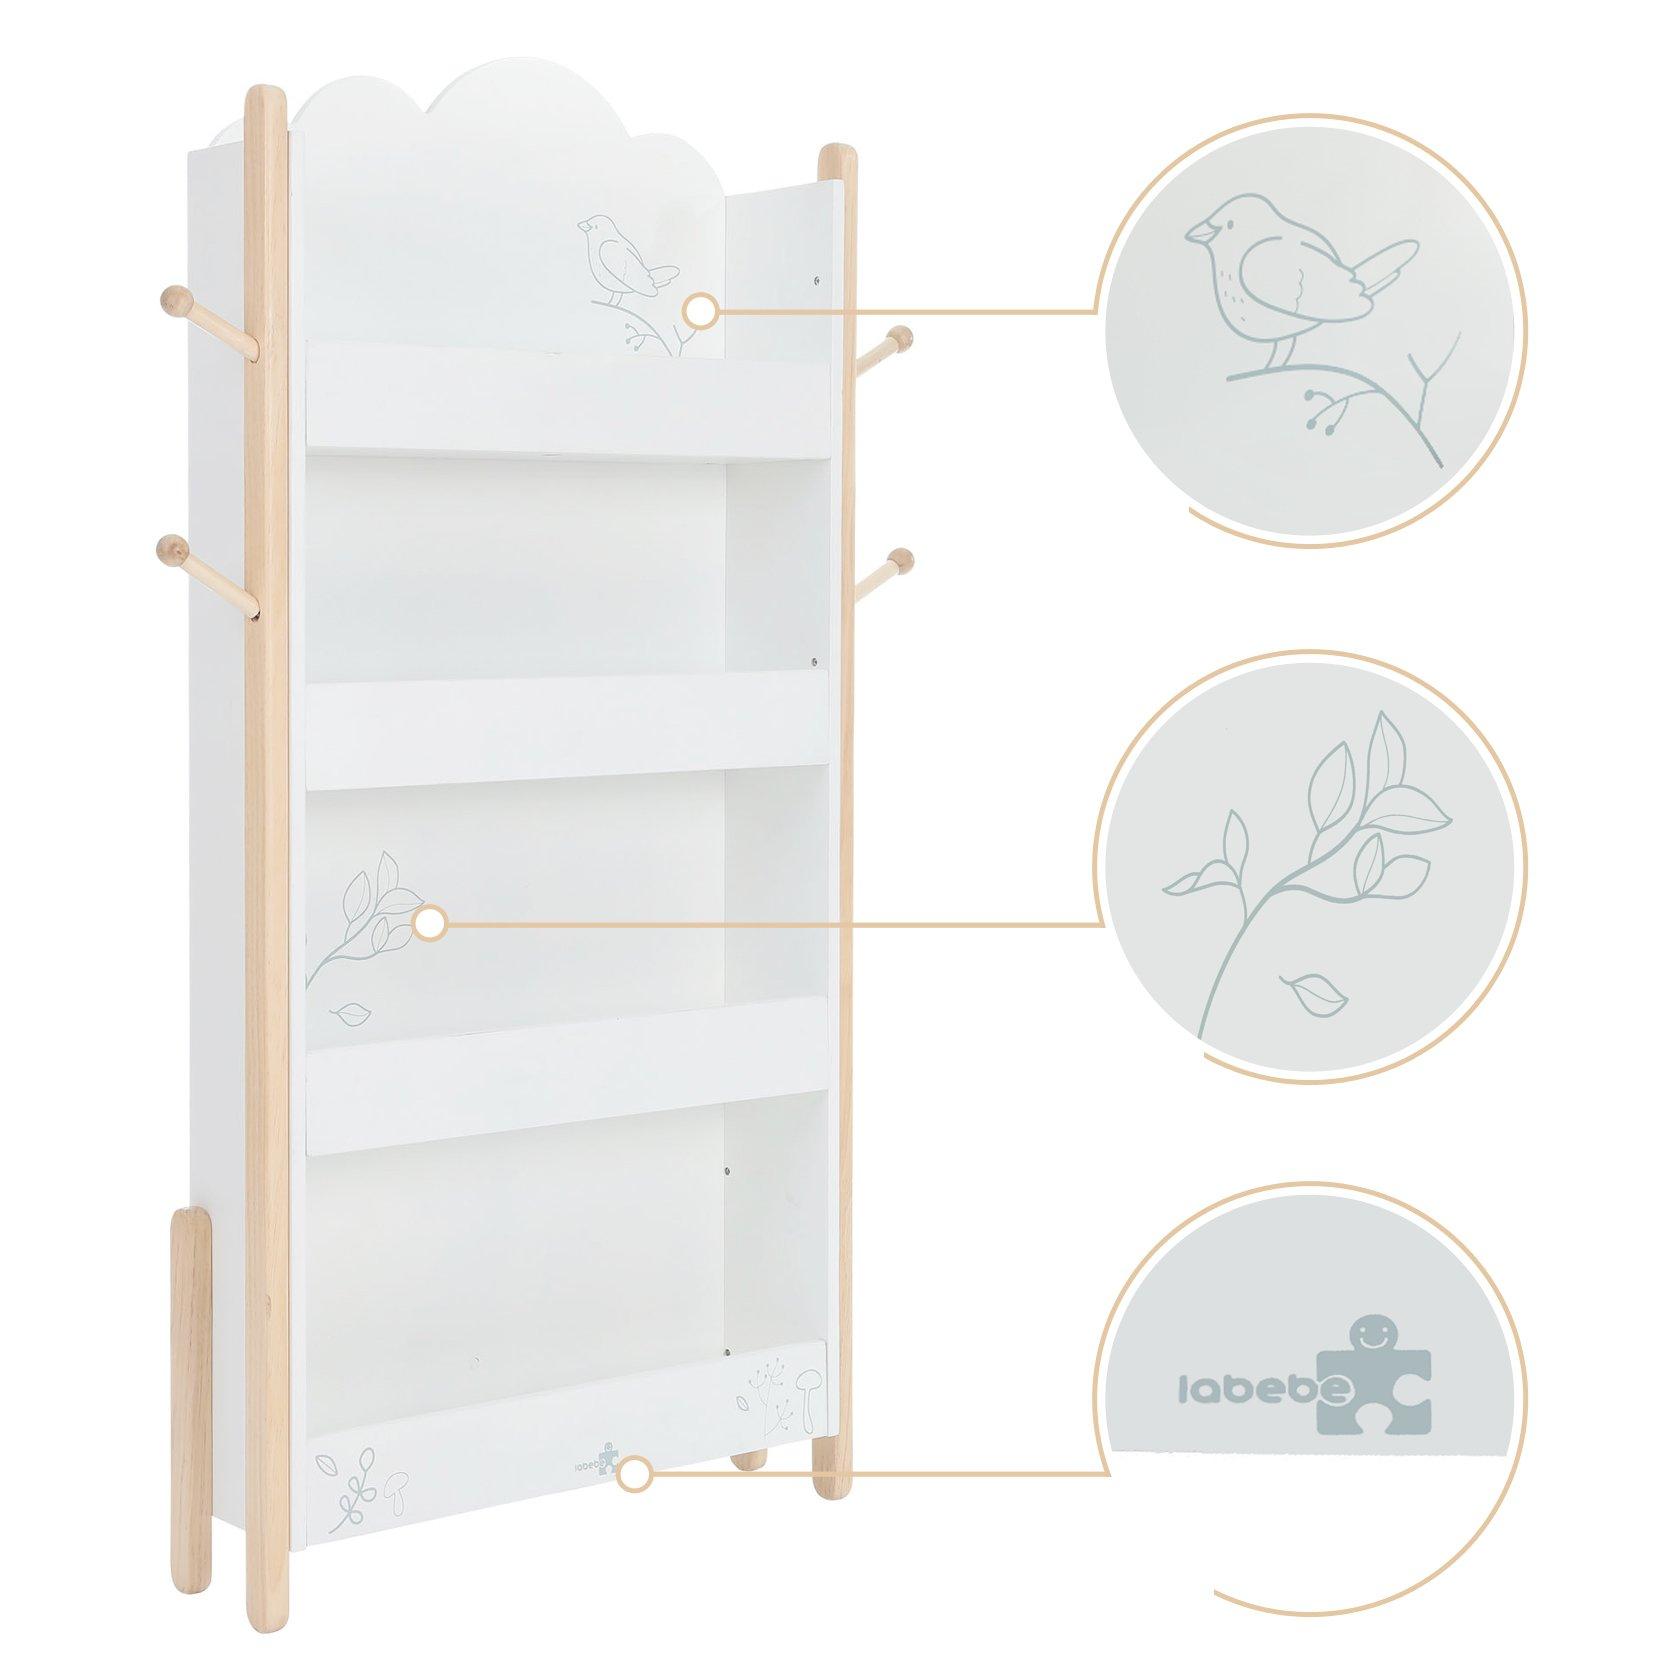 Labebe Kid Bookshelf With Wheels Wood White Bird